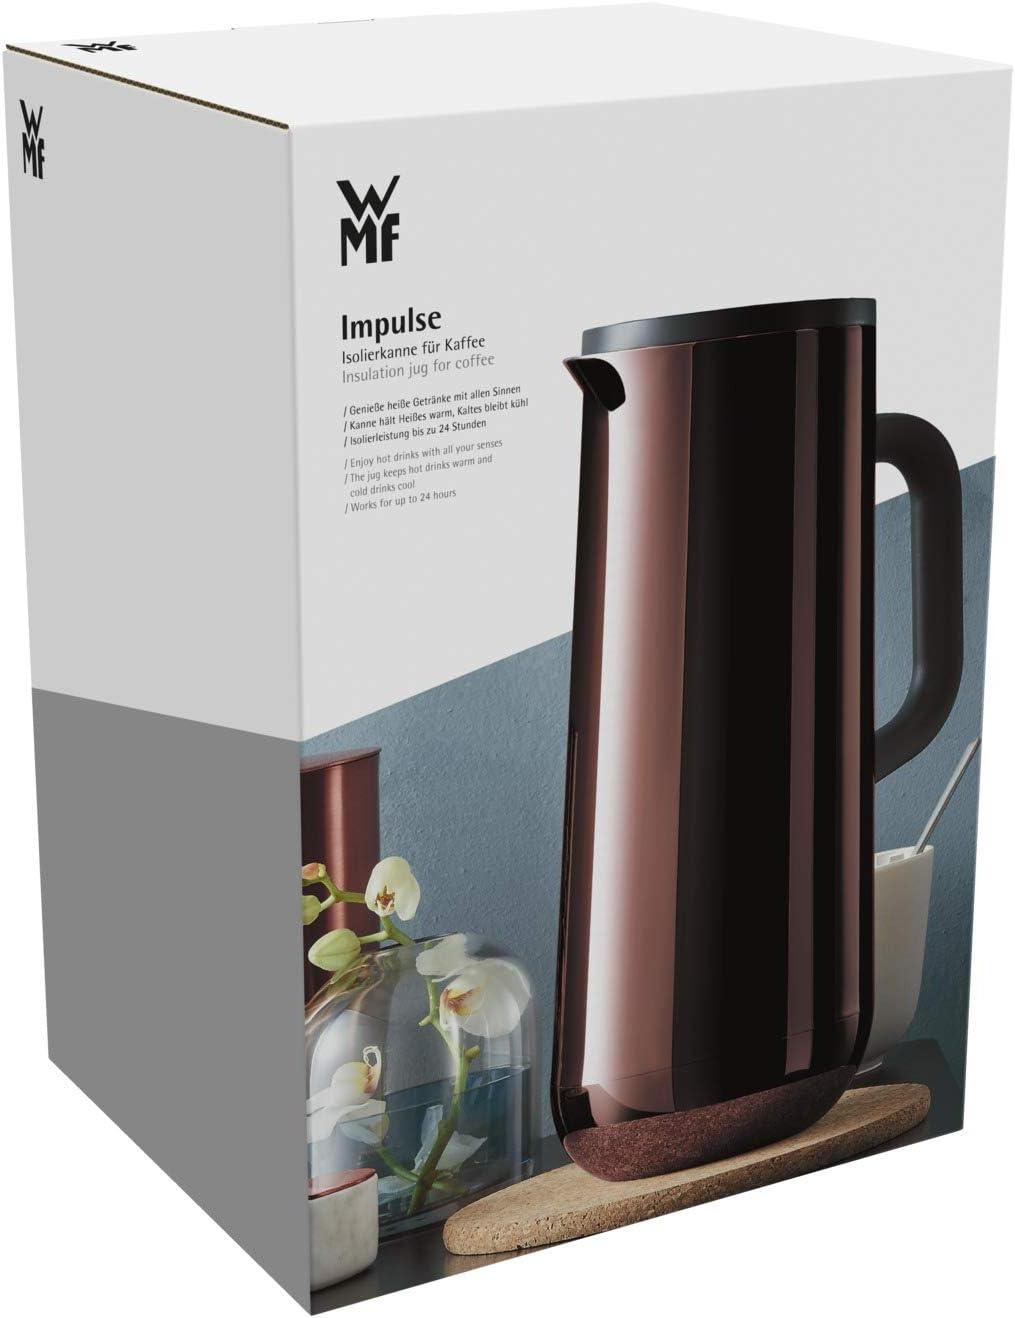 WMF Impulse Isolierkanne für Tee 1Liter vintage Kupfer Cromargan Teekanne Kaffee